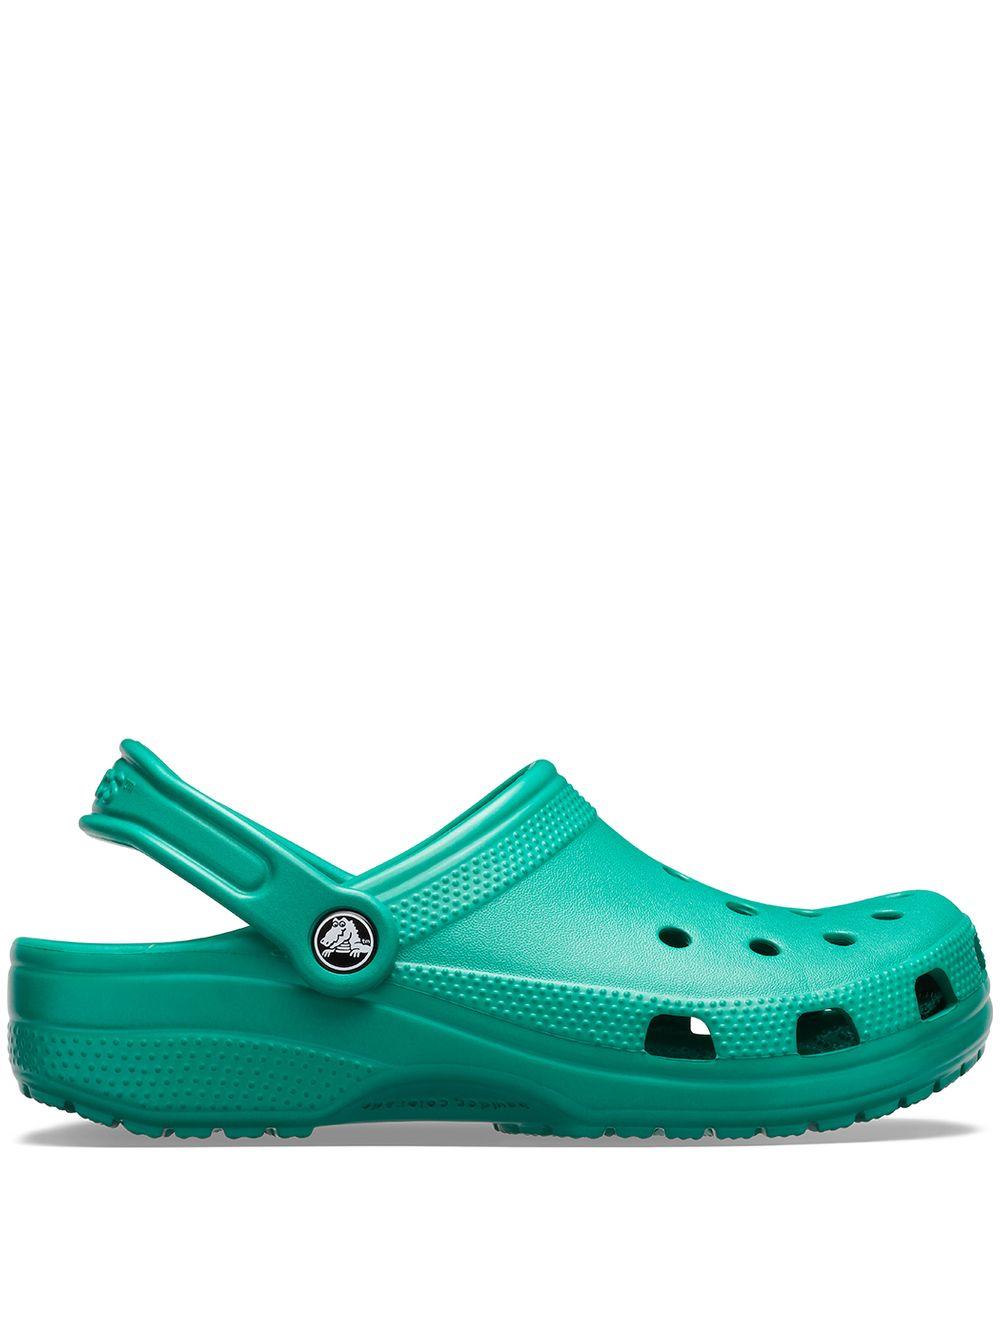 Sandalo classic